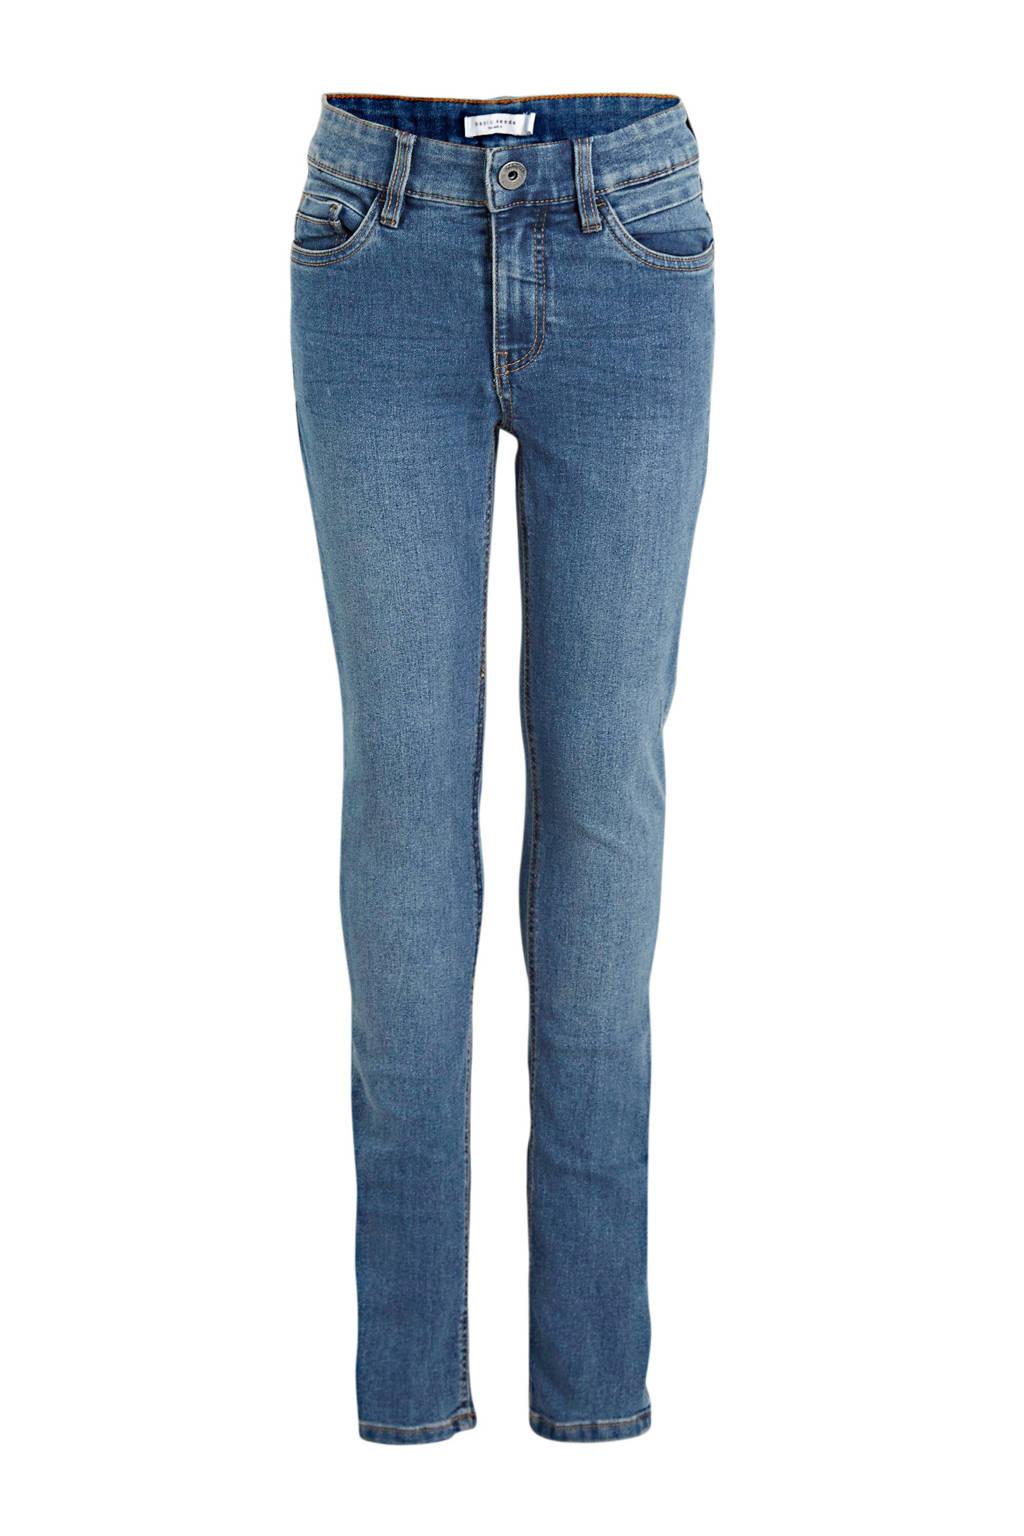 NAME IT KIDS X-slim fit jeans Theo stonewashed, Stonewashed